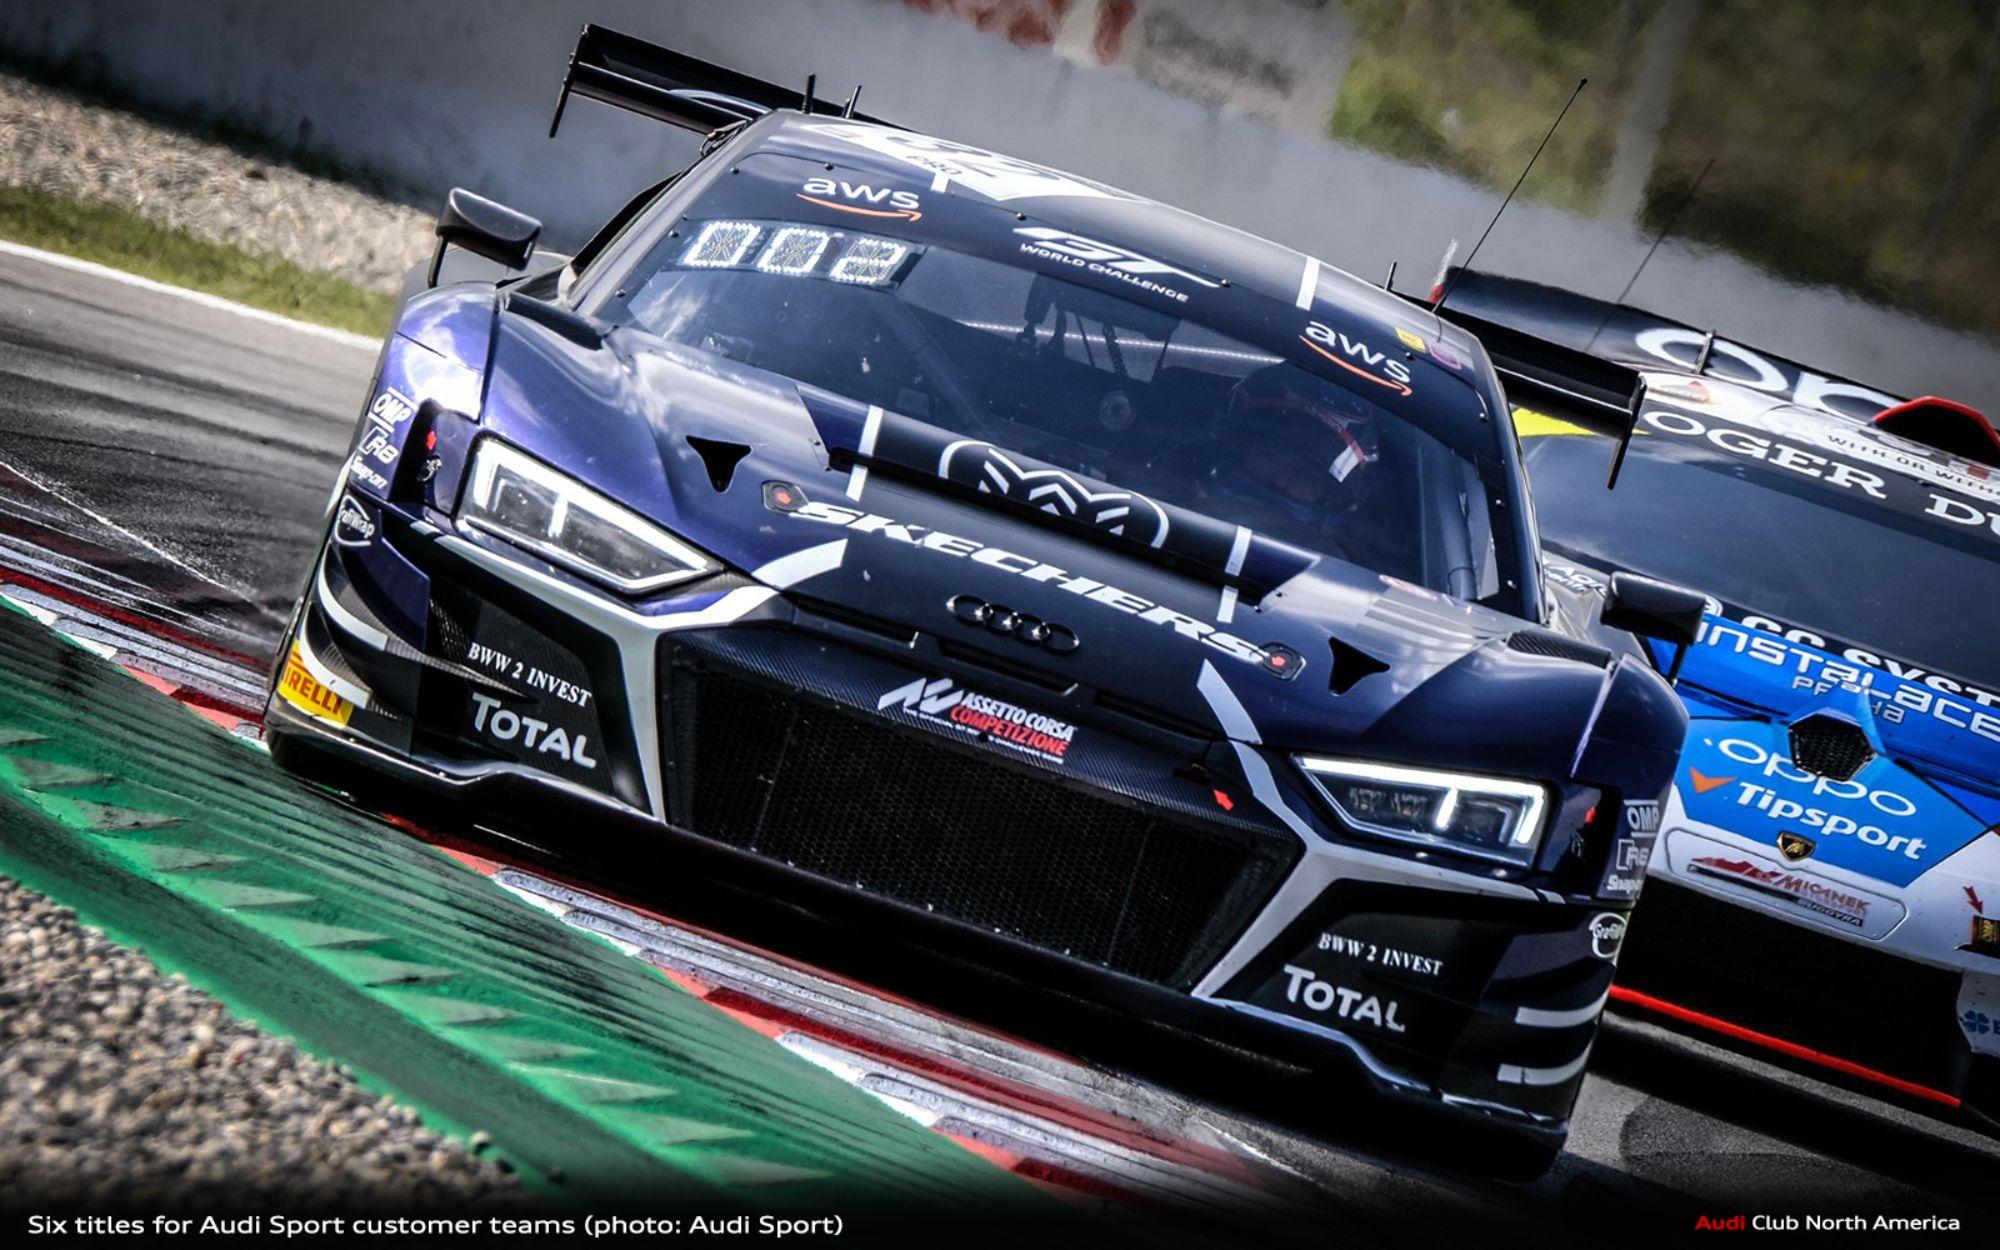 Six titles for Audi Sport customer teams